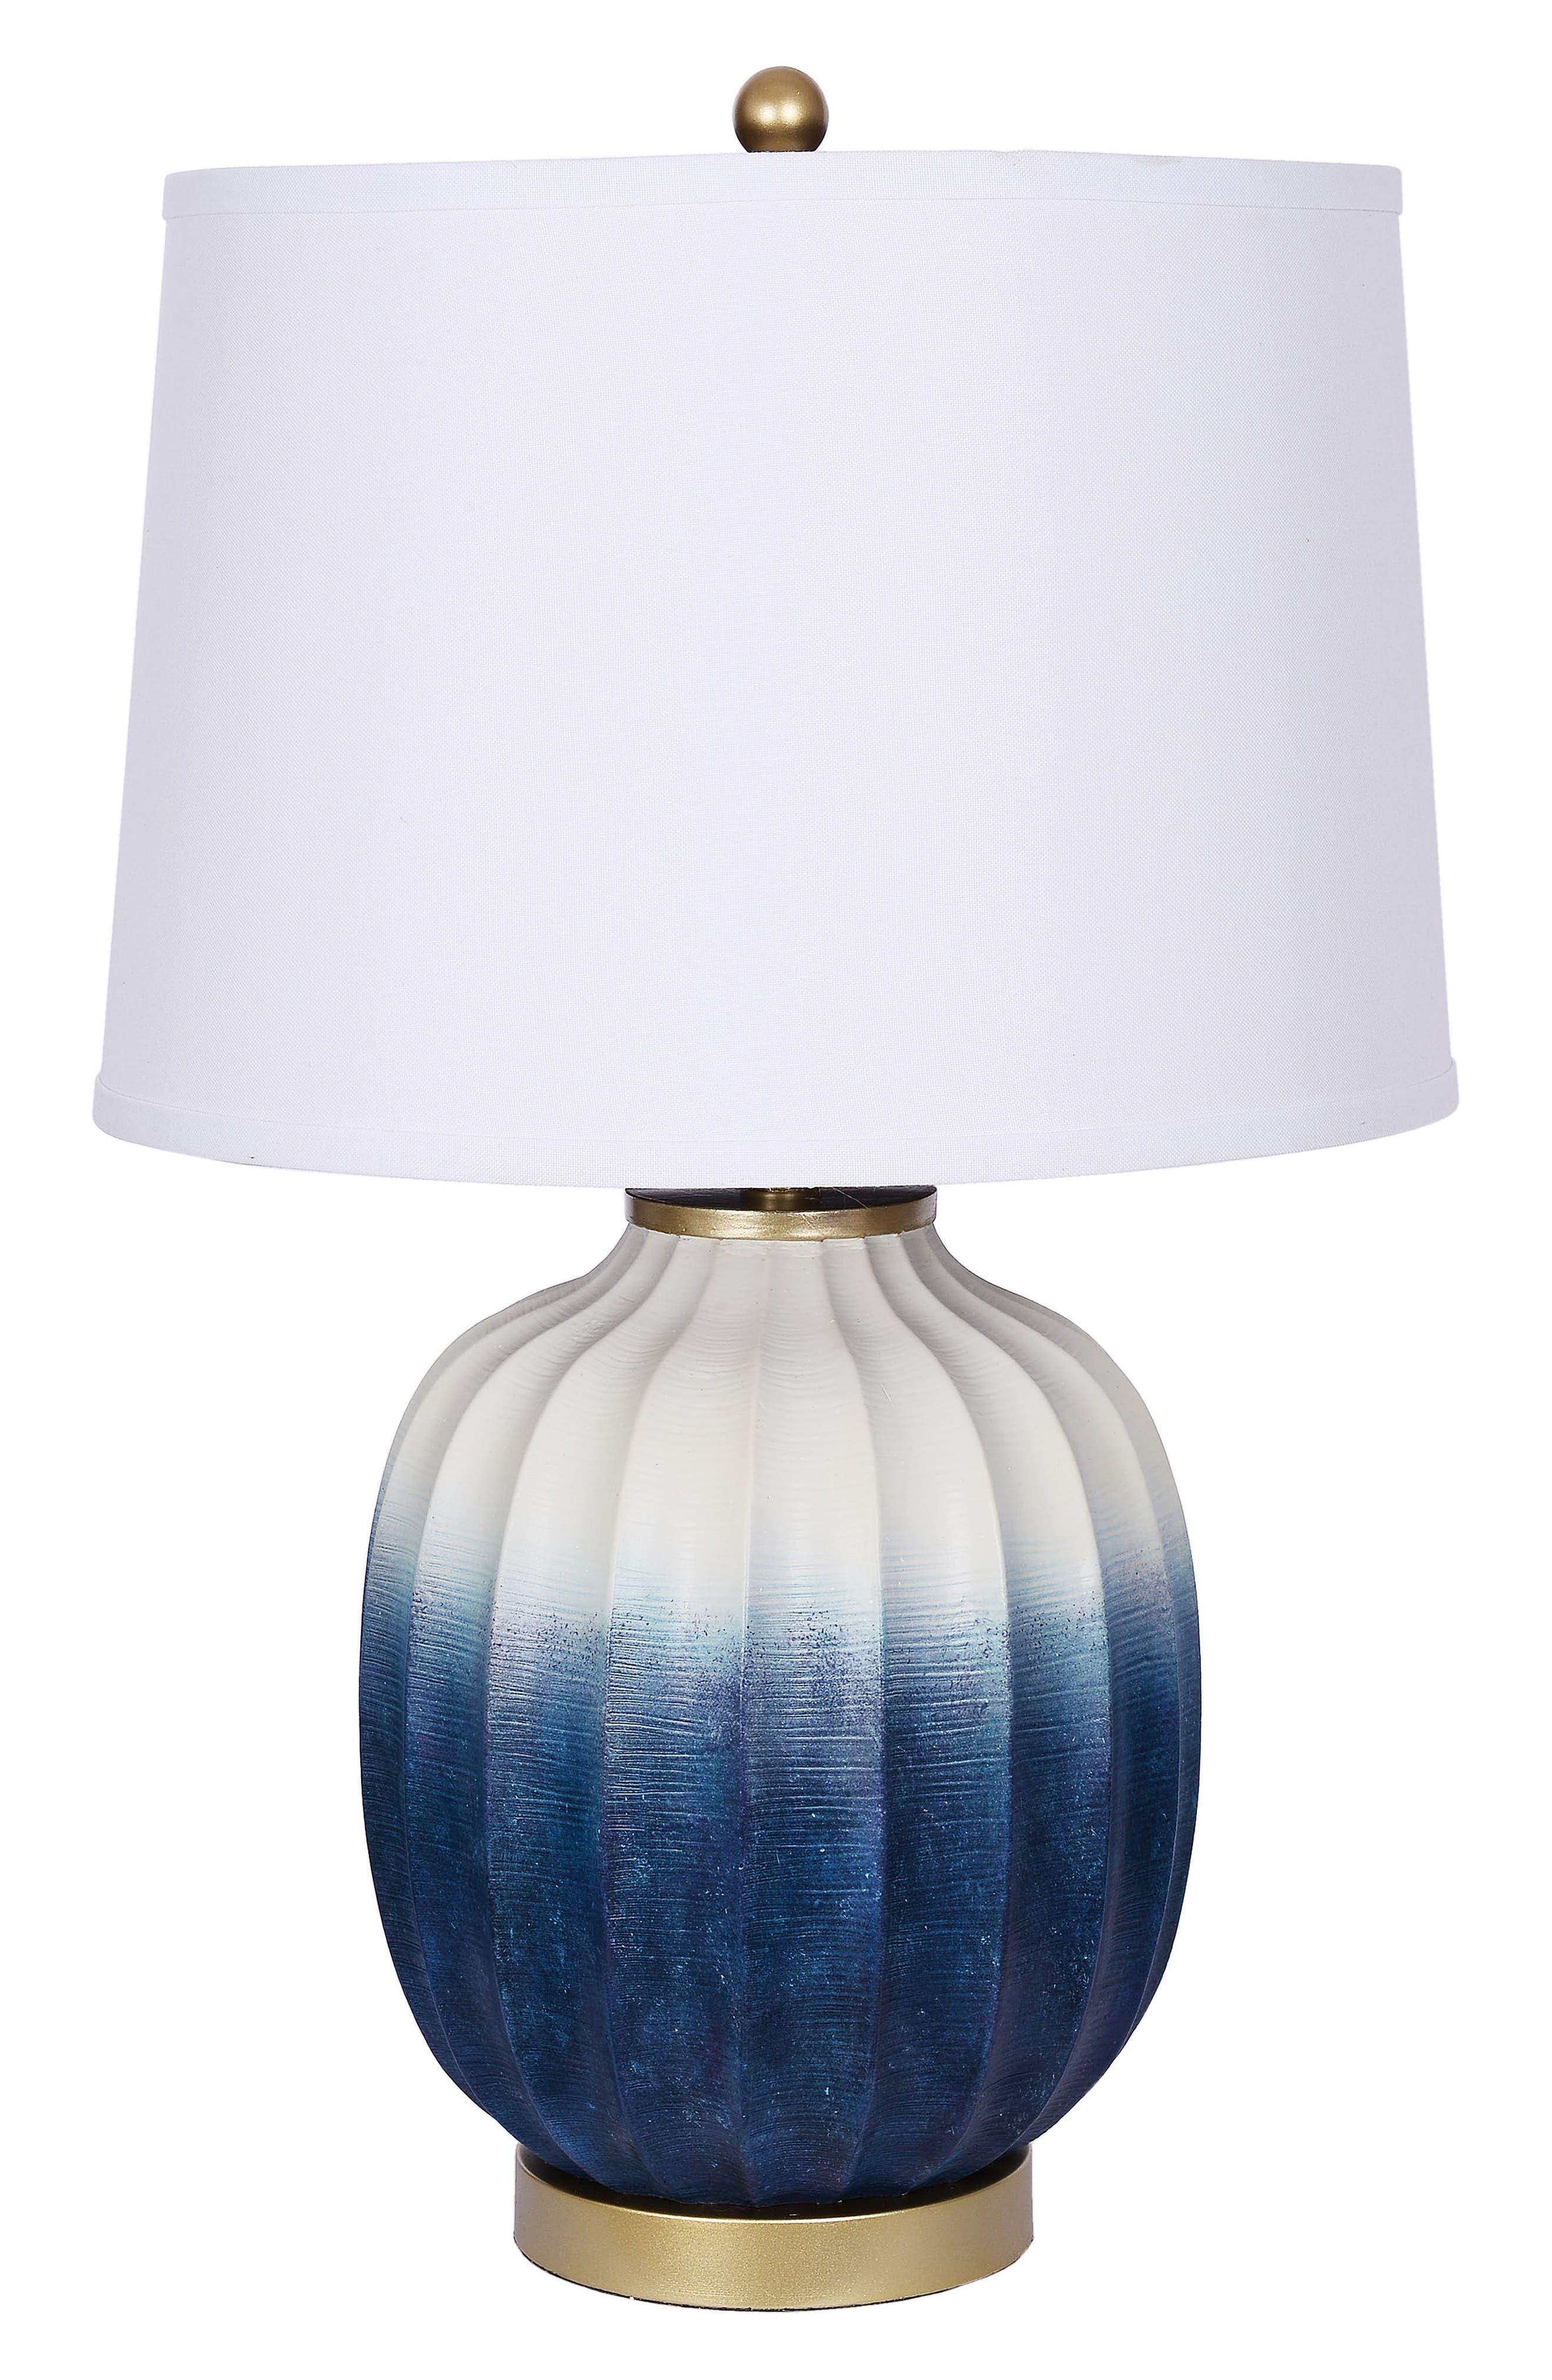 JALEXANDER LIGHTING,                             JAlexander Ombré Table Lamp,                             Main thumbnail 1, color,                             400